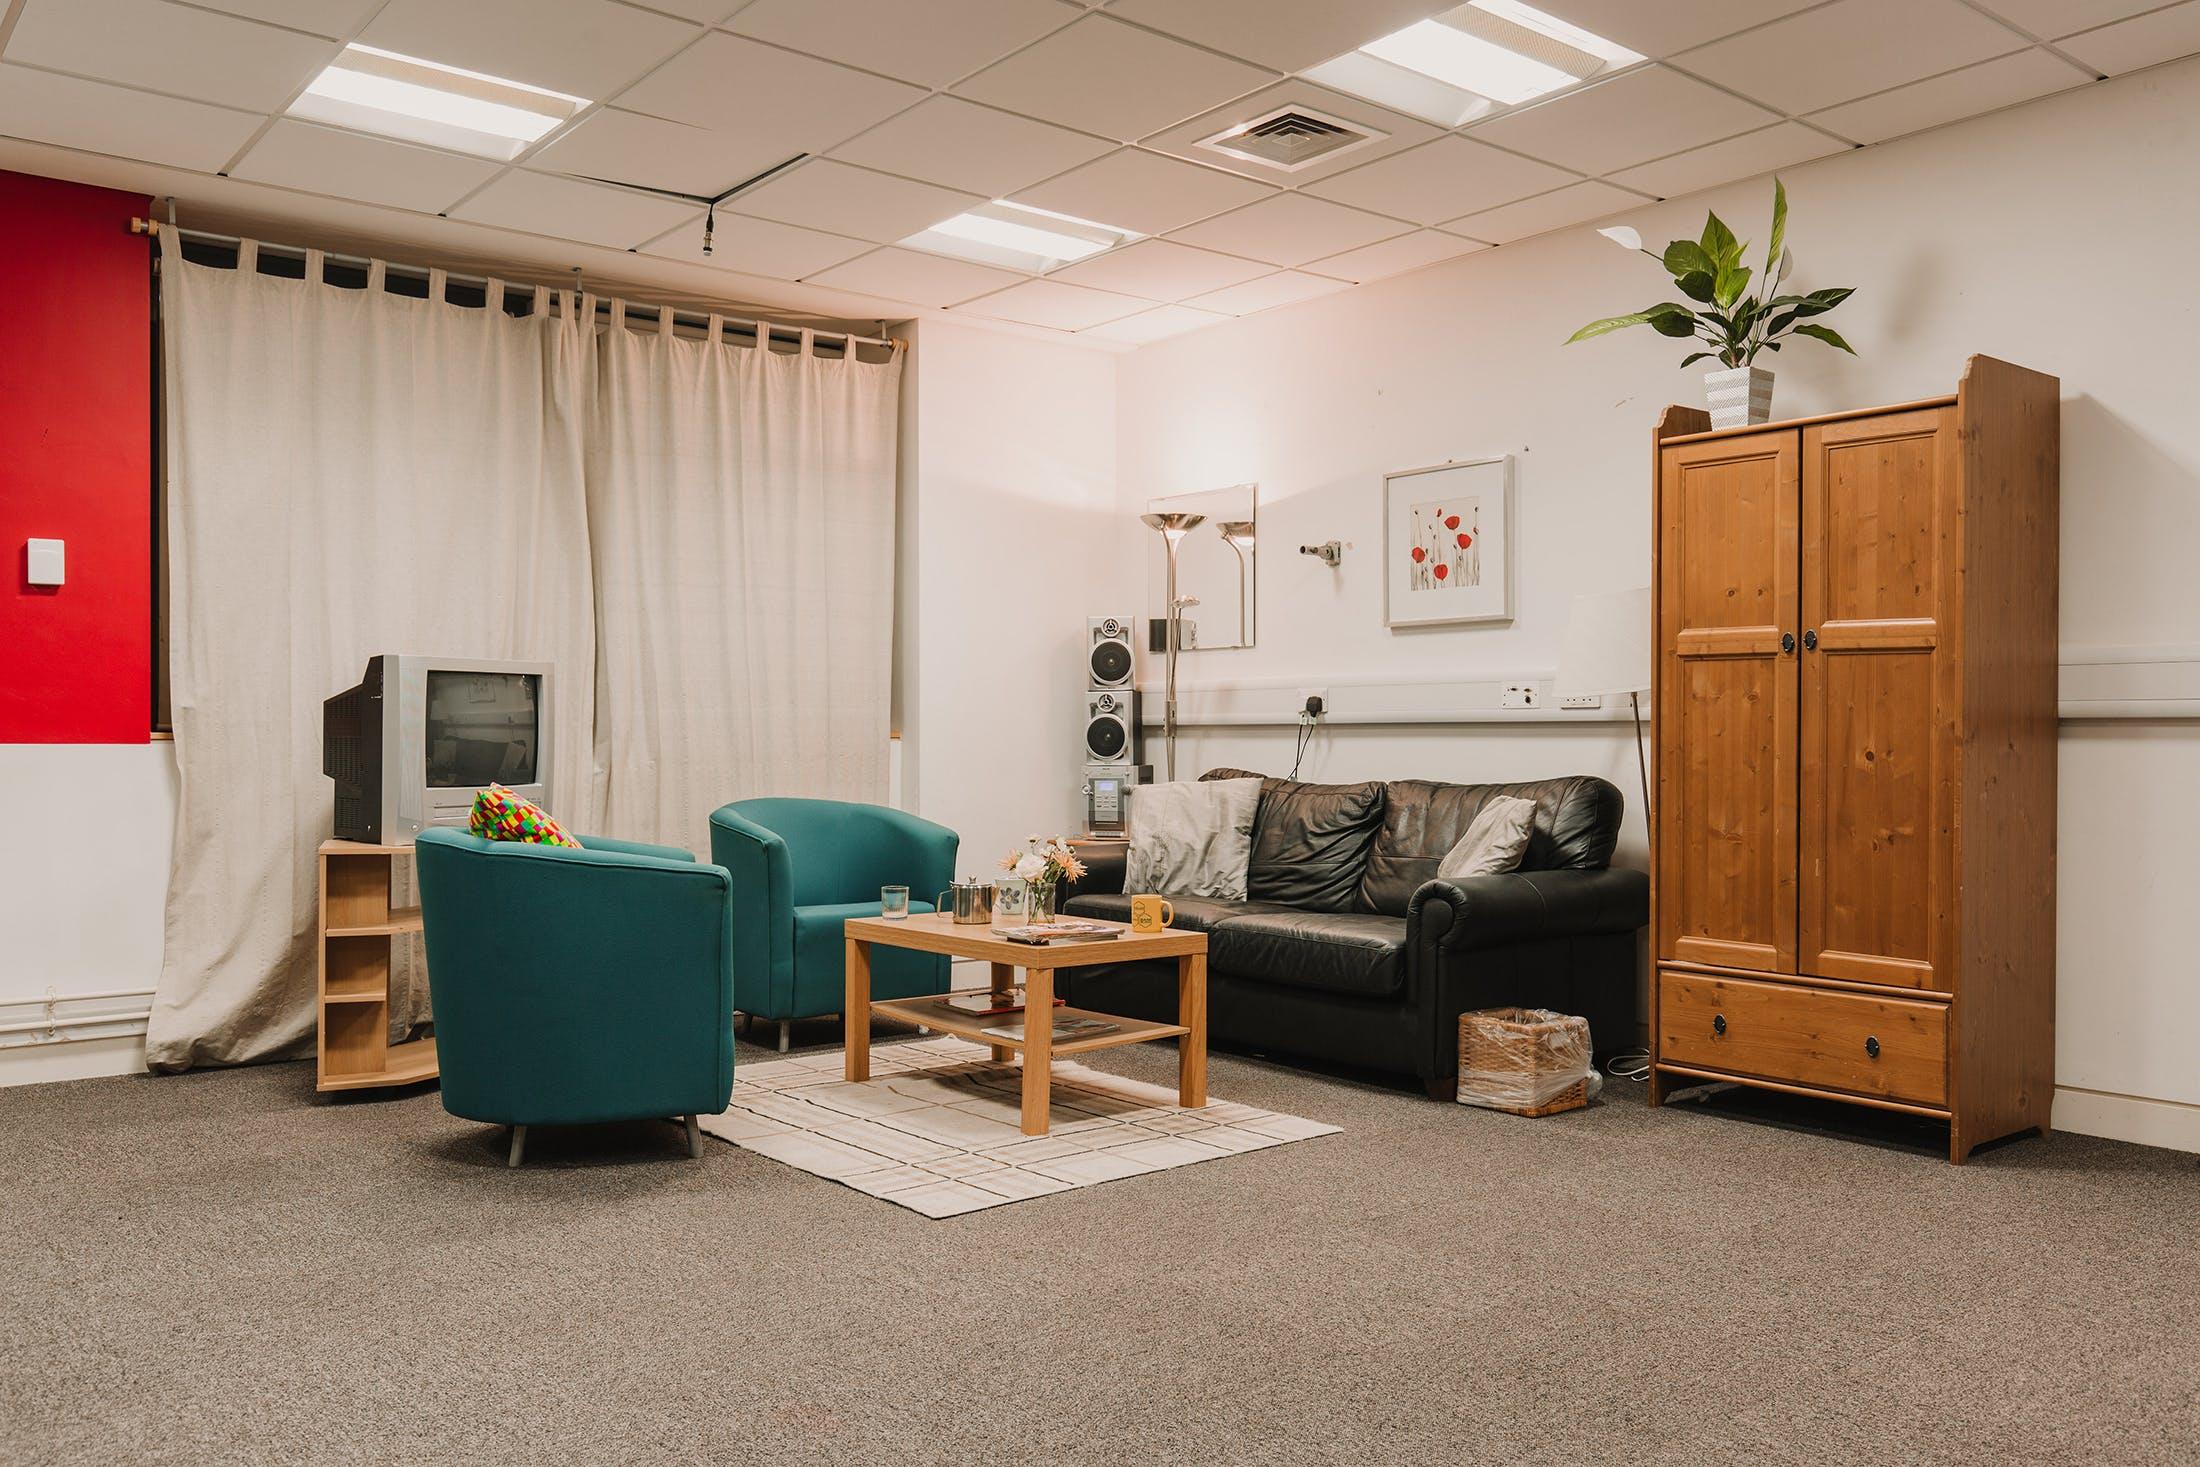 Nursing and Midwifery facilities - 10 home environment